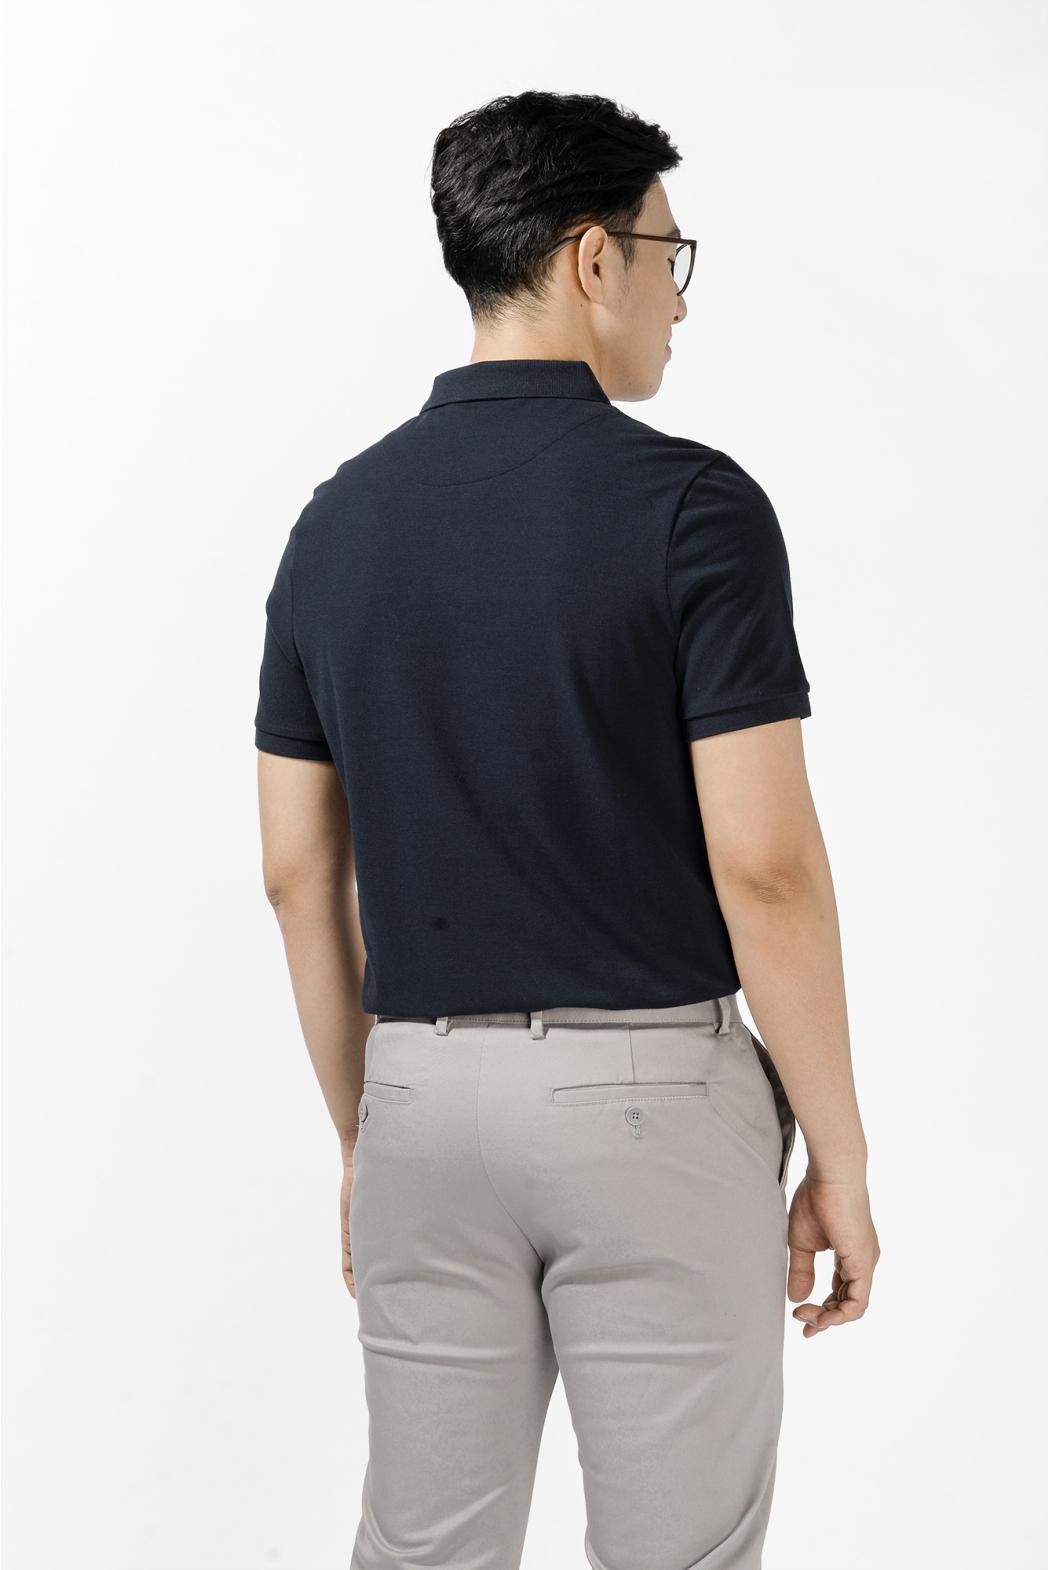 Áo Polo phối rã in sọc. FITTED form - 10S21POL003